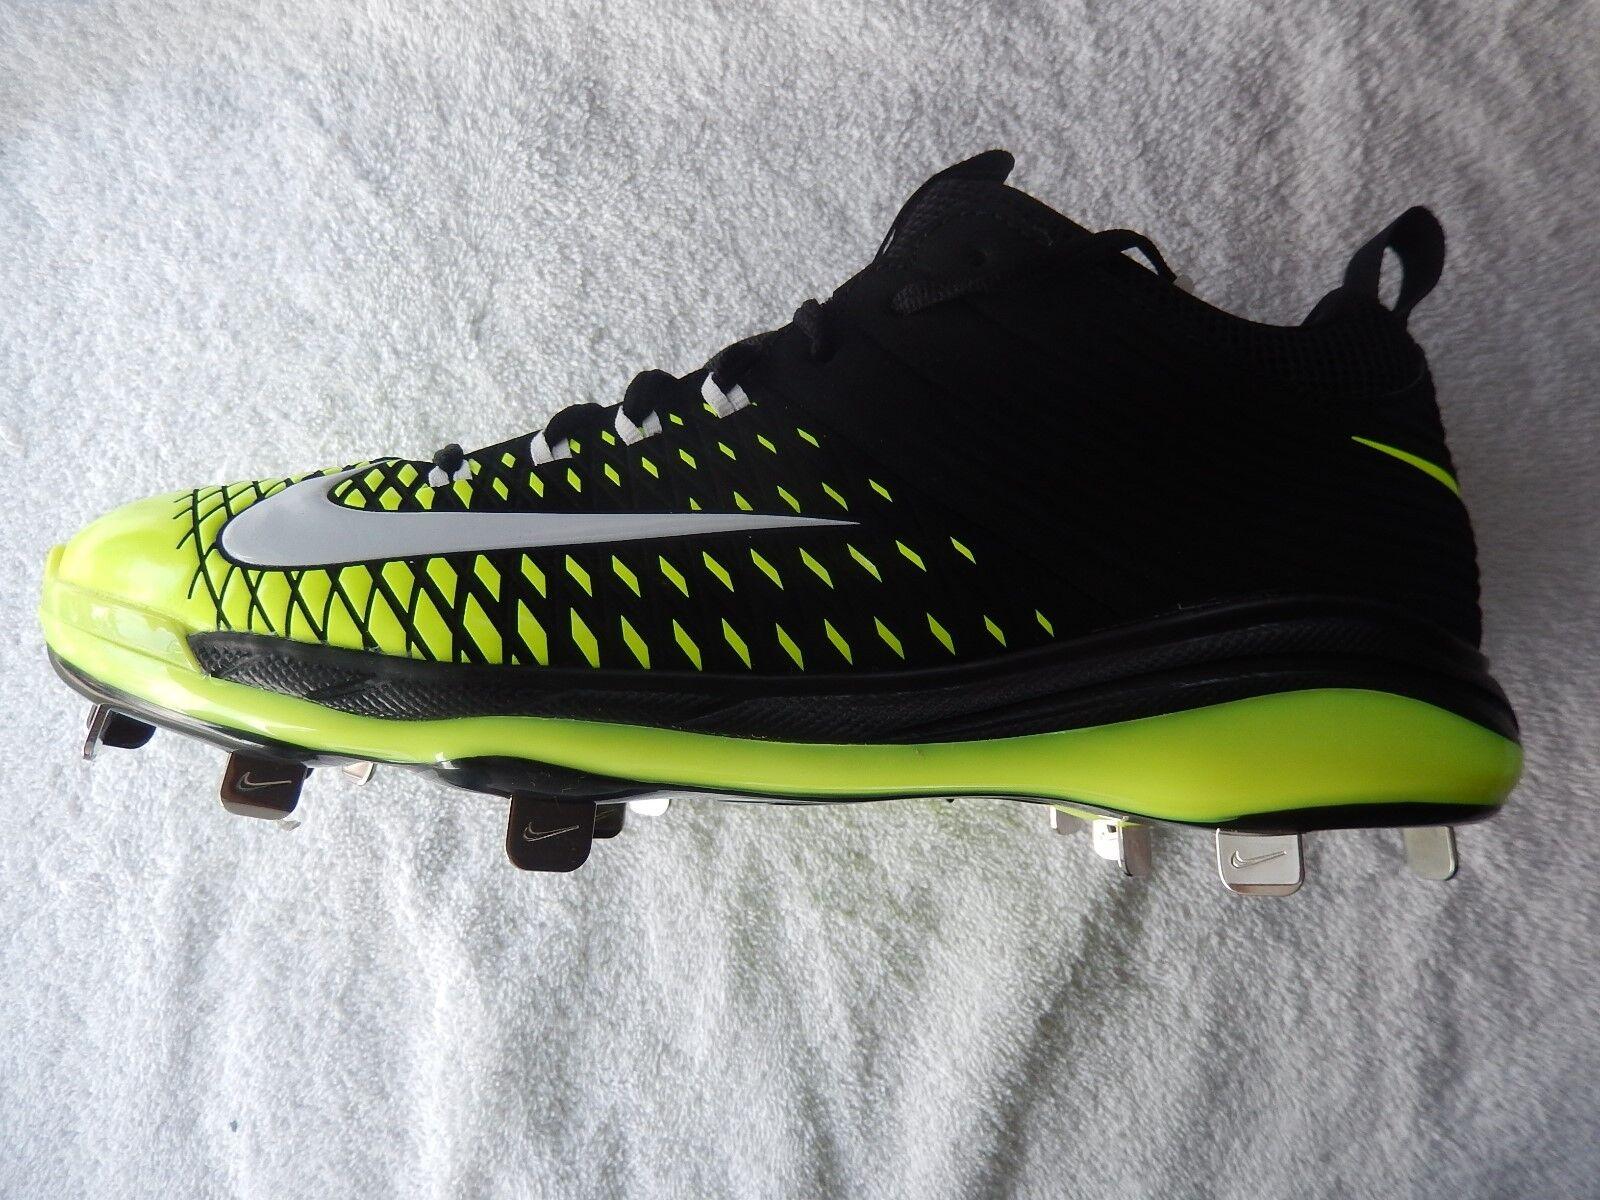 Nike Trout 2 Pro Metal Baseball Cleats - Black, Volt, White - New Comfortable Cheap women's shoes women's shoes